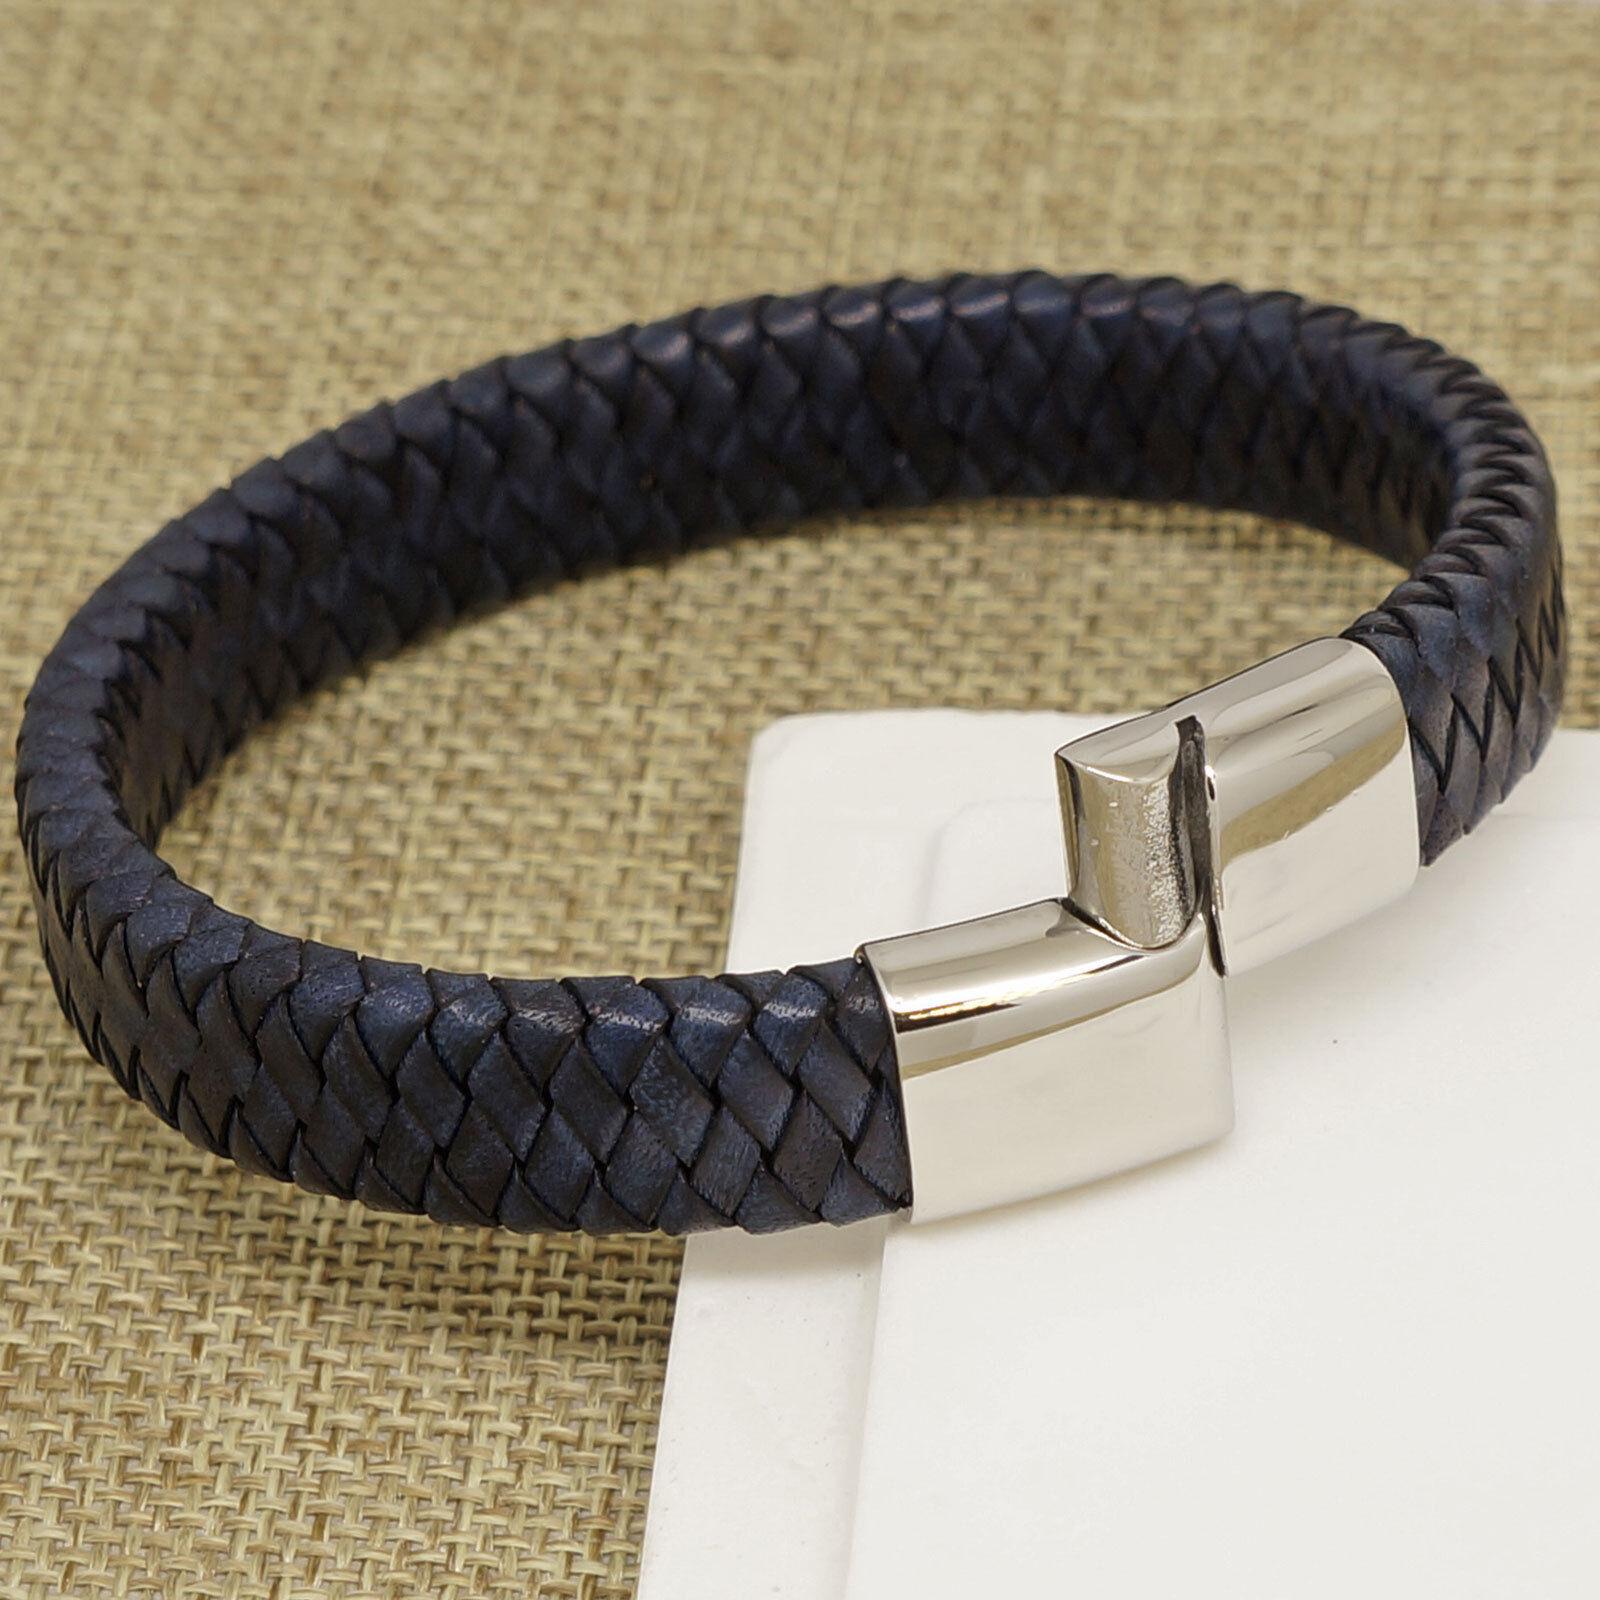 dfa08ed50906 Details about Boys Mens NAVY BLUE Genuine Italian Leather Wrap Bracelet  Steel Magnetic Clasp